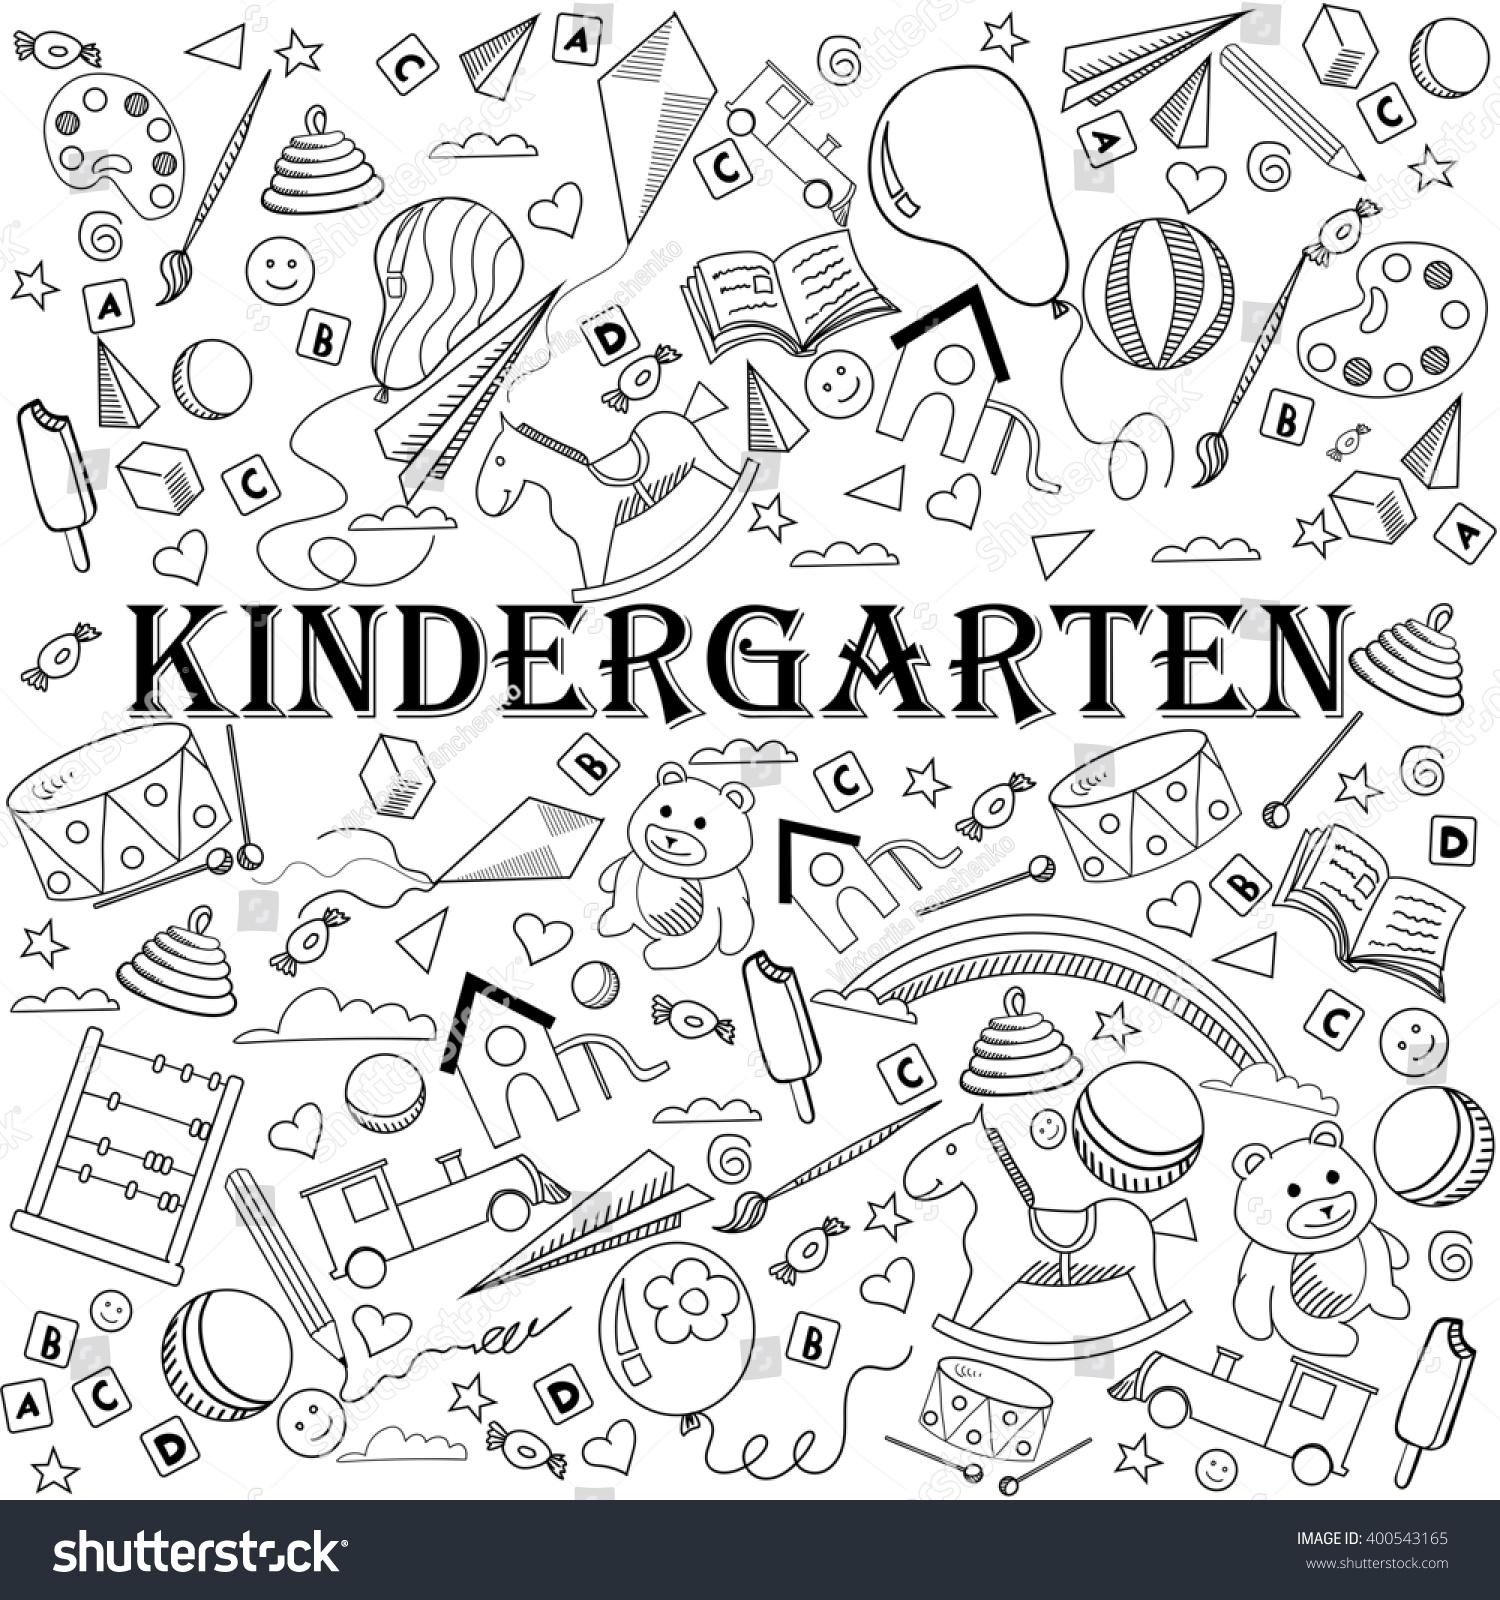 Kindergarten Coloring Book Line Art Design Raster Illustration Separate Objects Hand Drawn Doodle